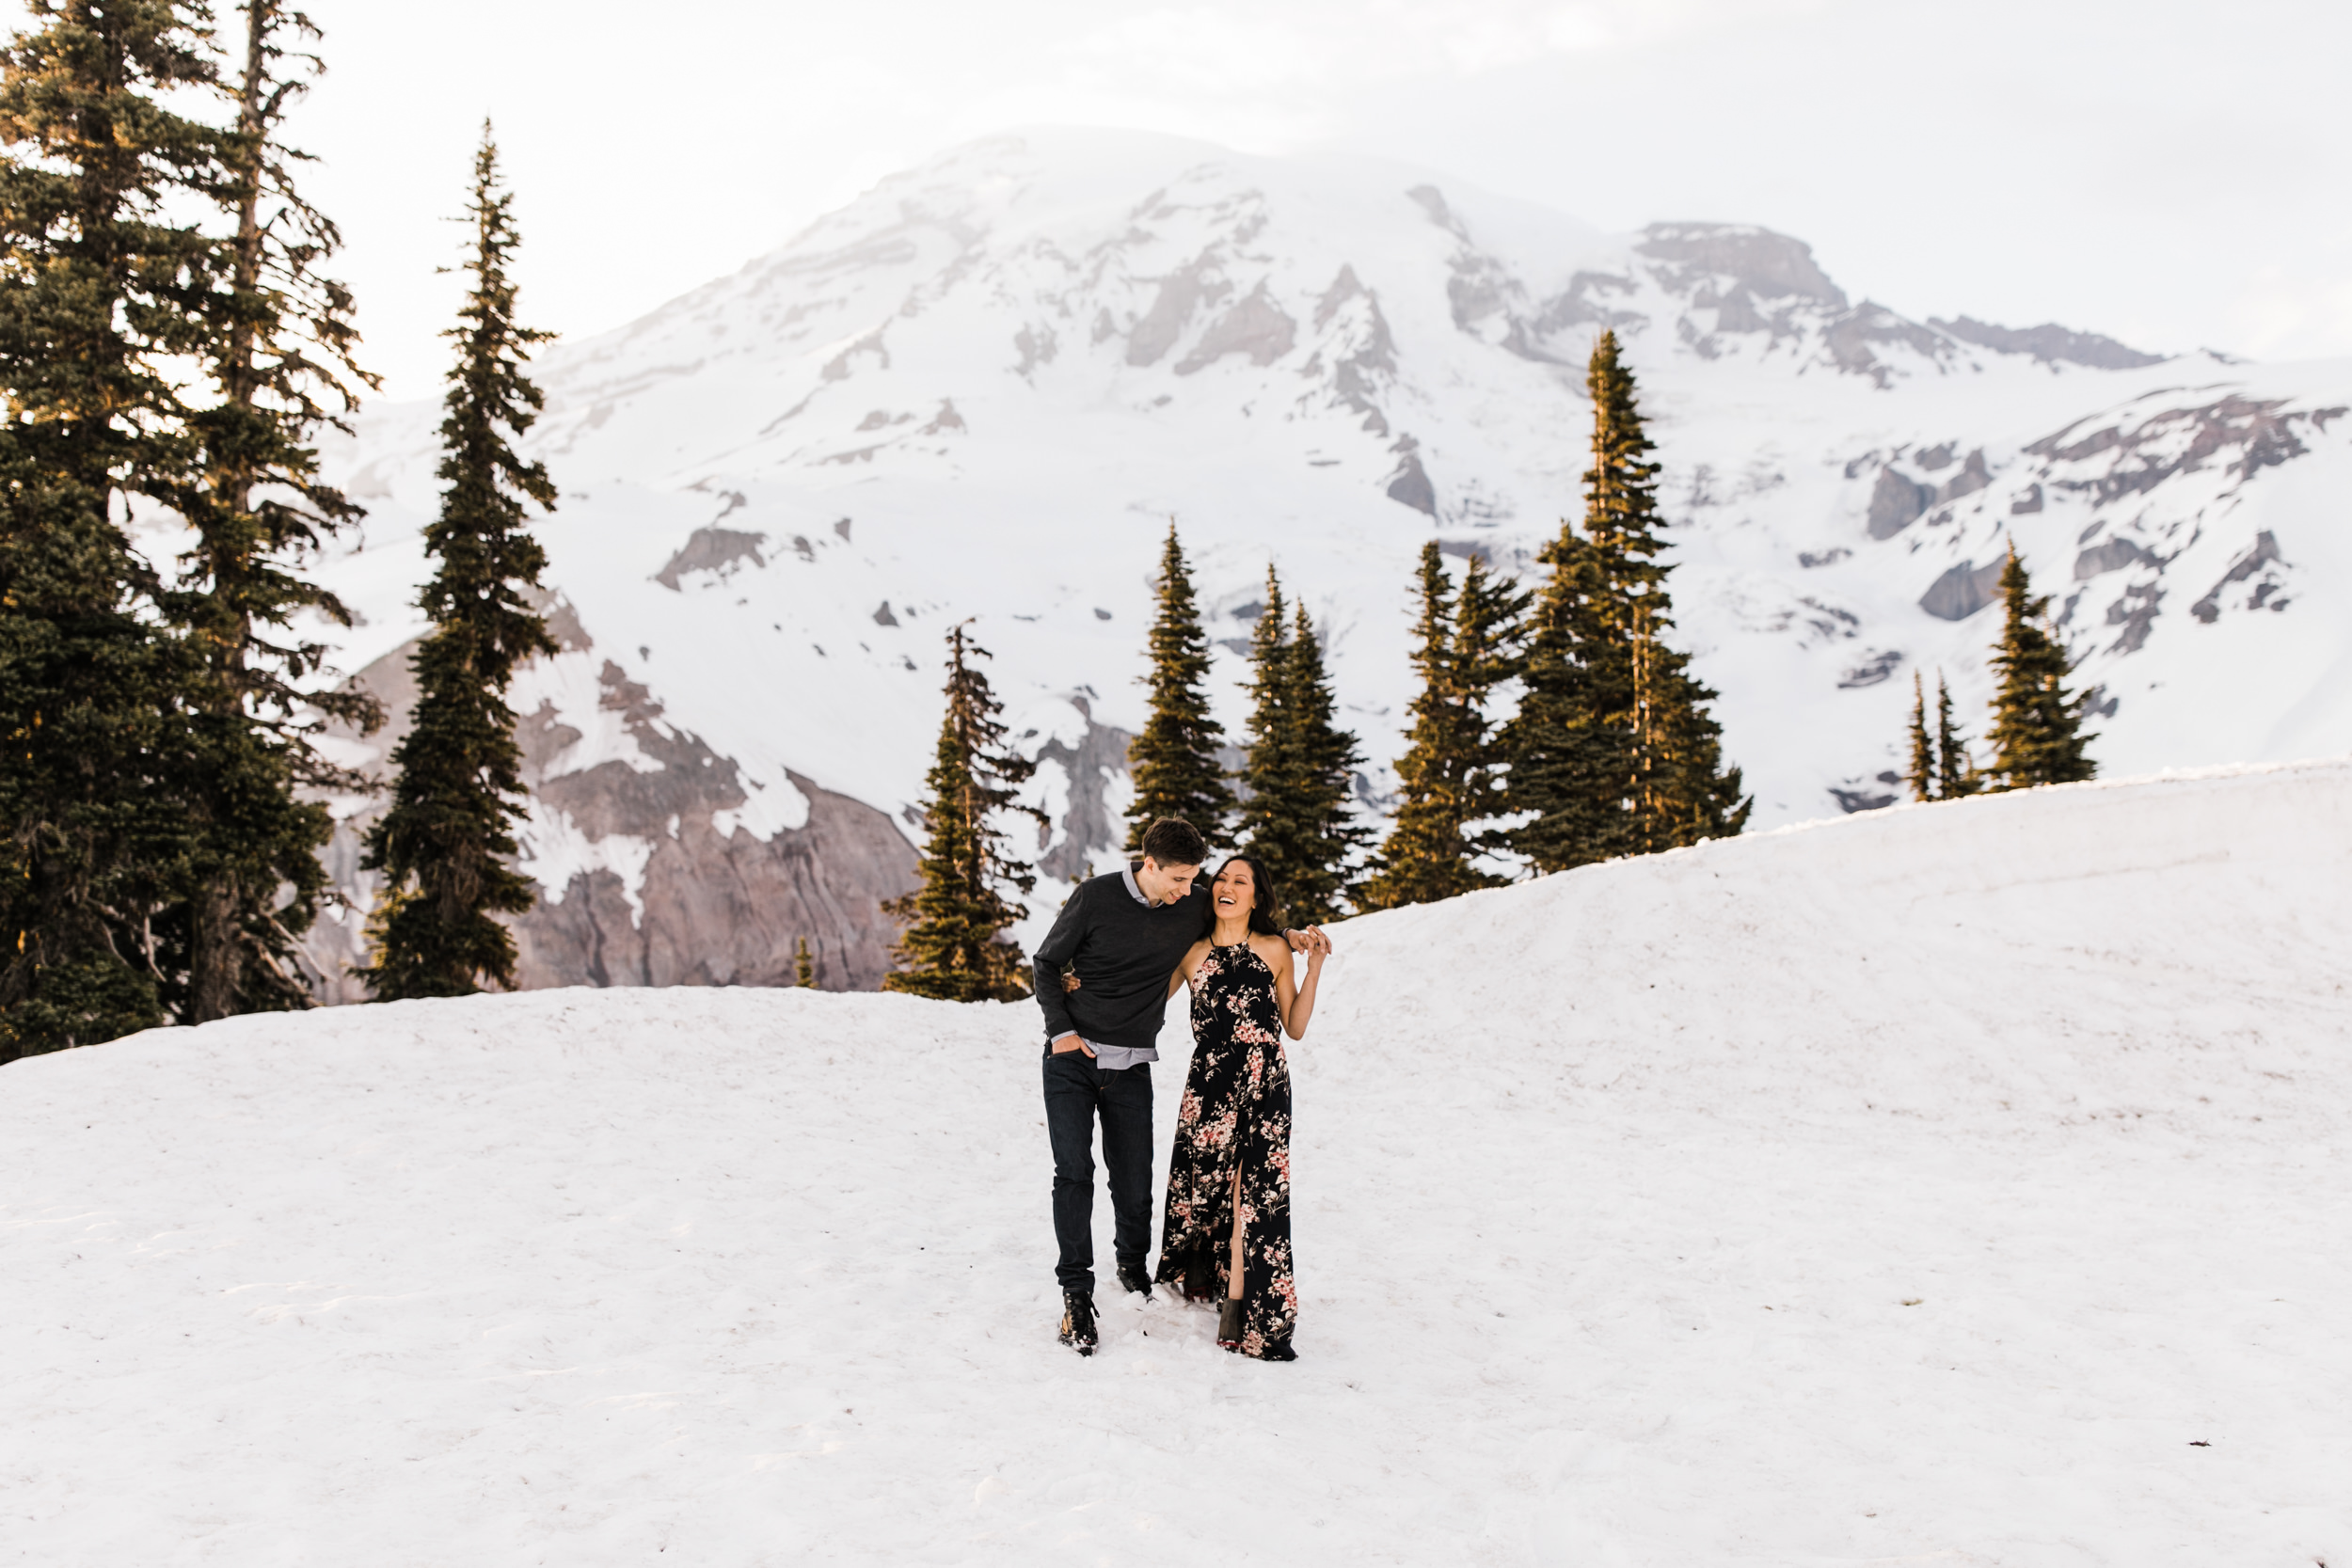 stacey + alec's snowy engagement session in mount rainier national park | national park elopement photographer | adventure wedding photographer | the hearnes adventure photography